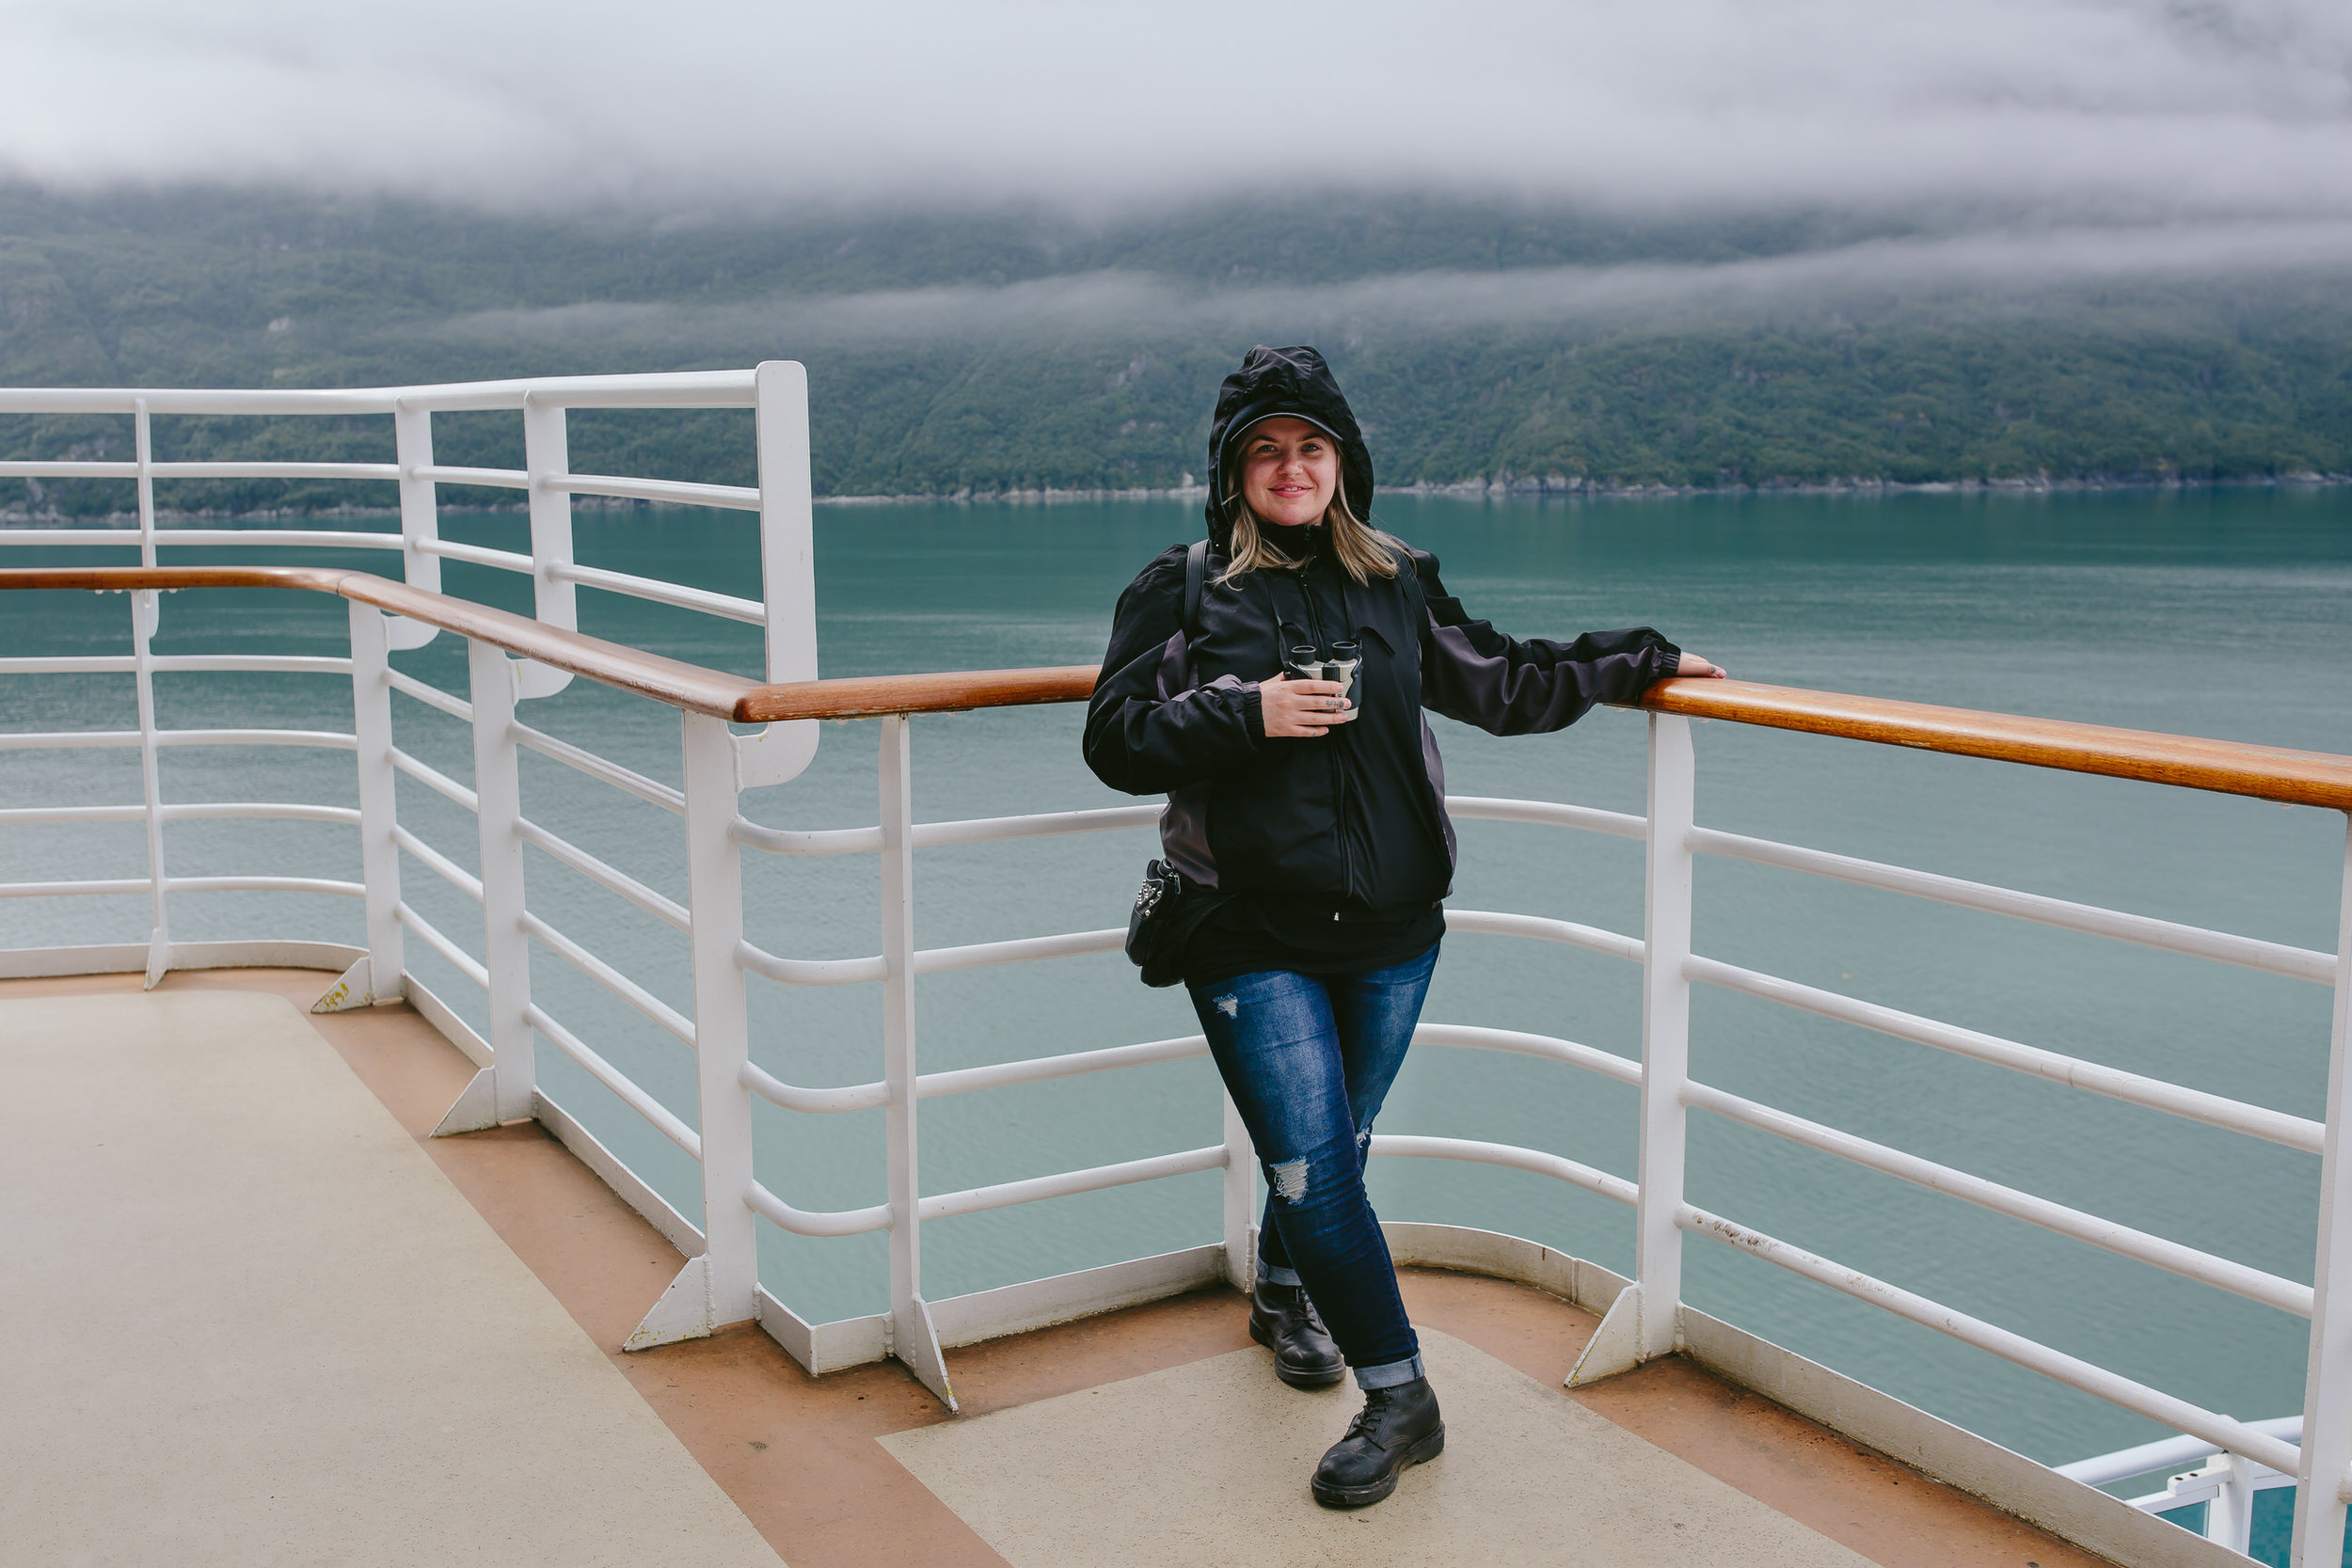 cruise-day-5 glacier bay-2.jpg